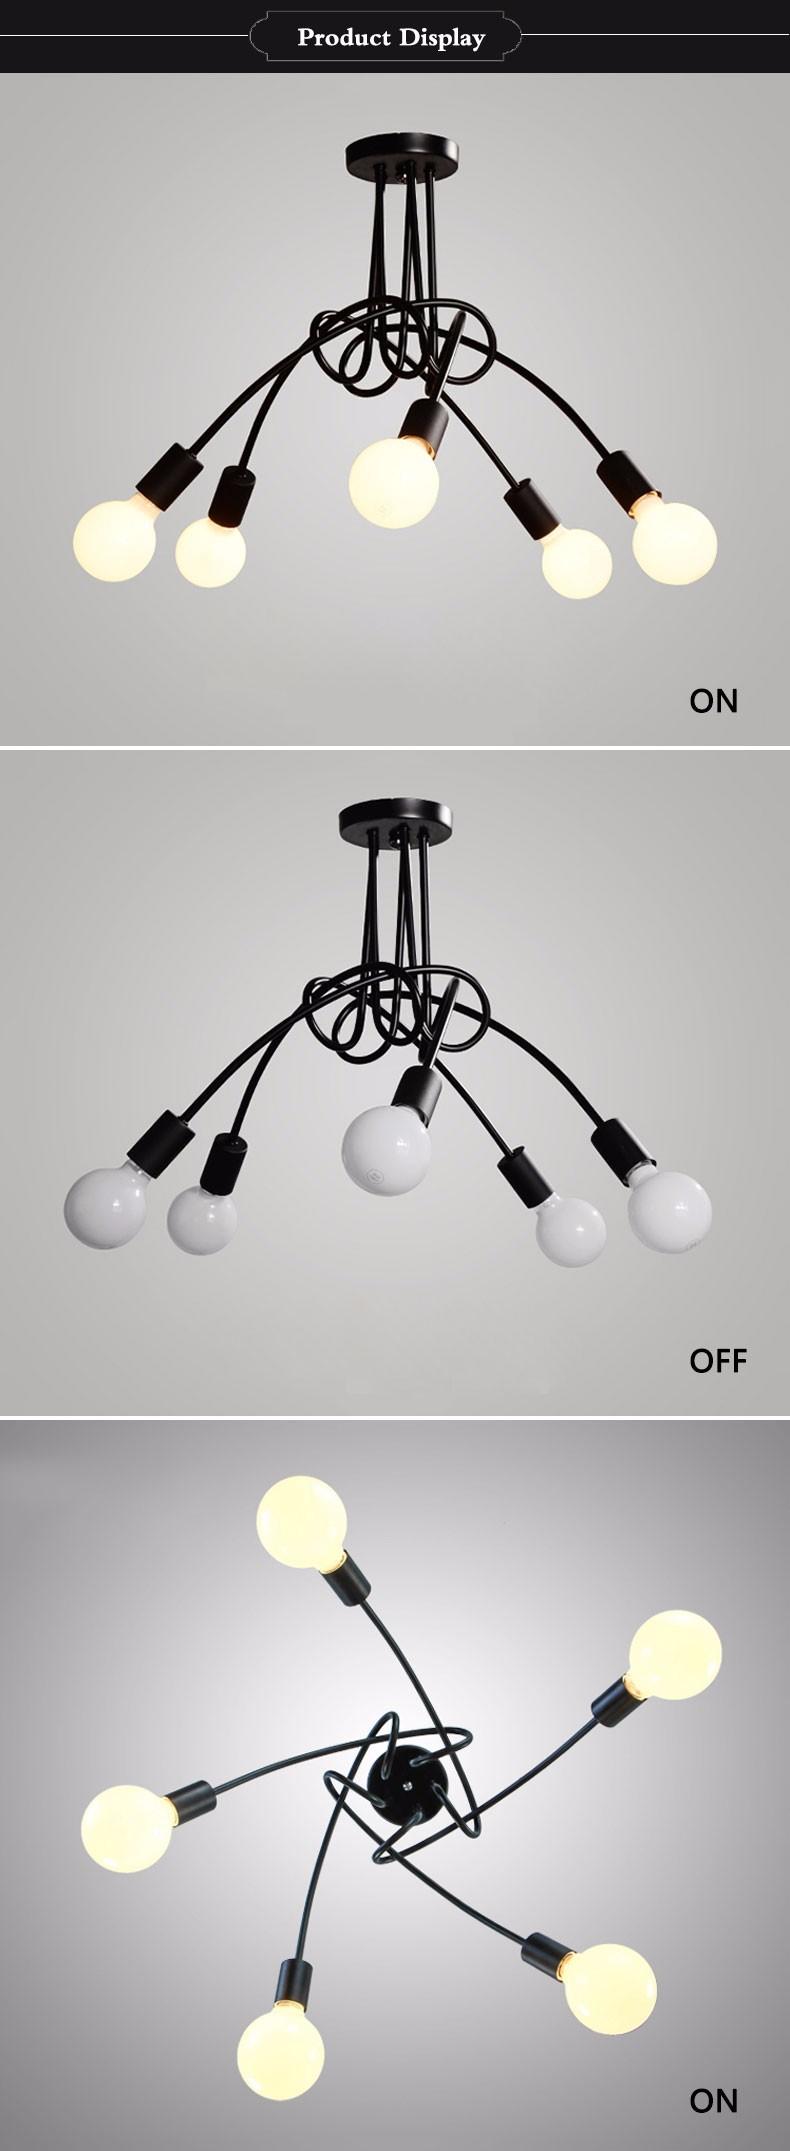 Vintage Plafond Lumi¨res Luminaria Lumi¨re Lustre Fer Tuyau Lampe